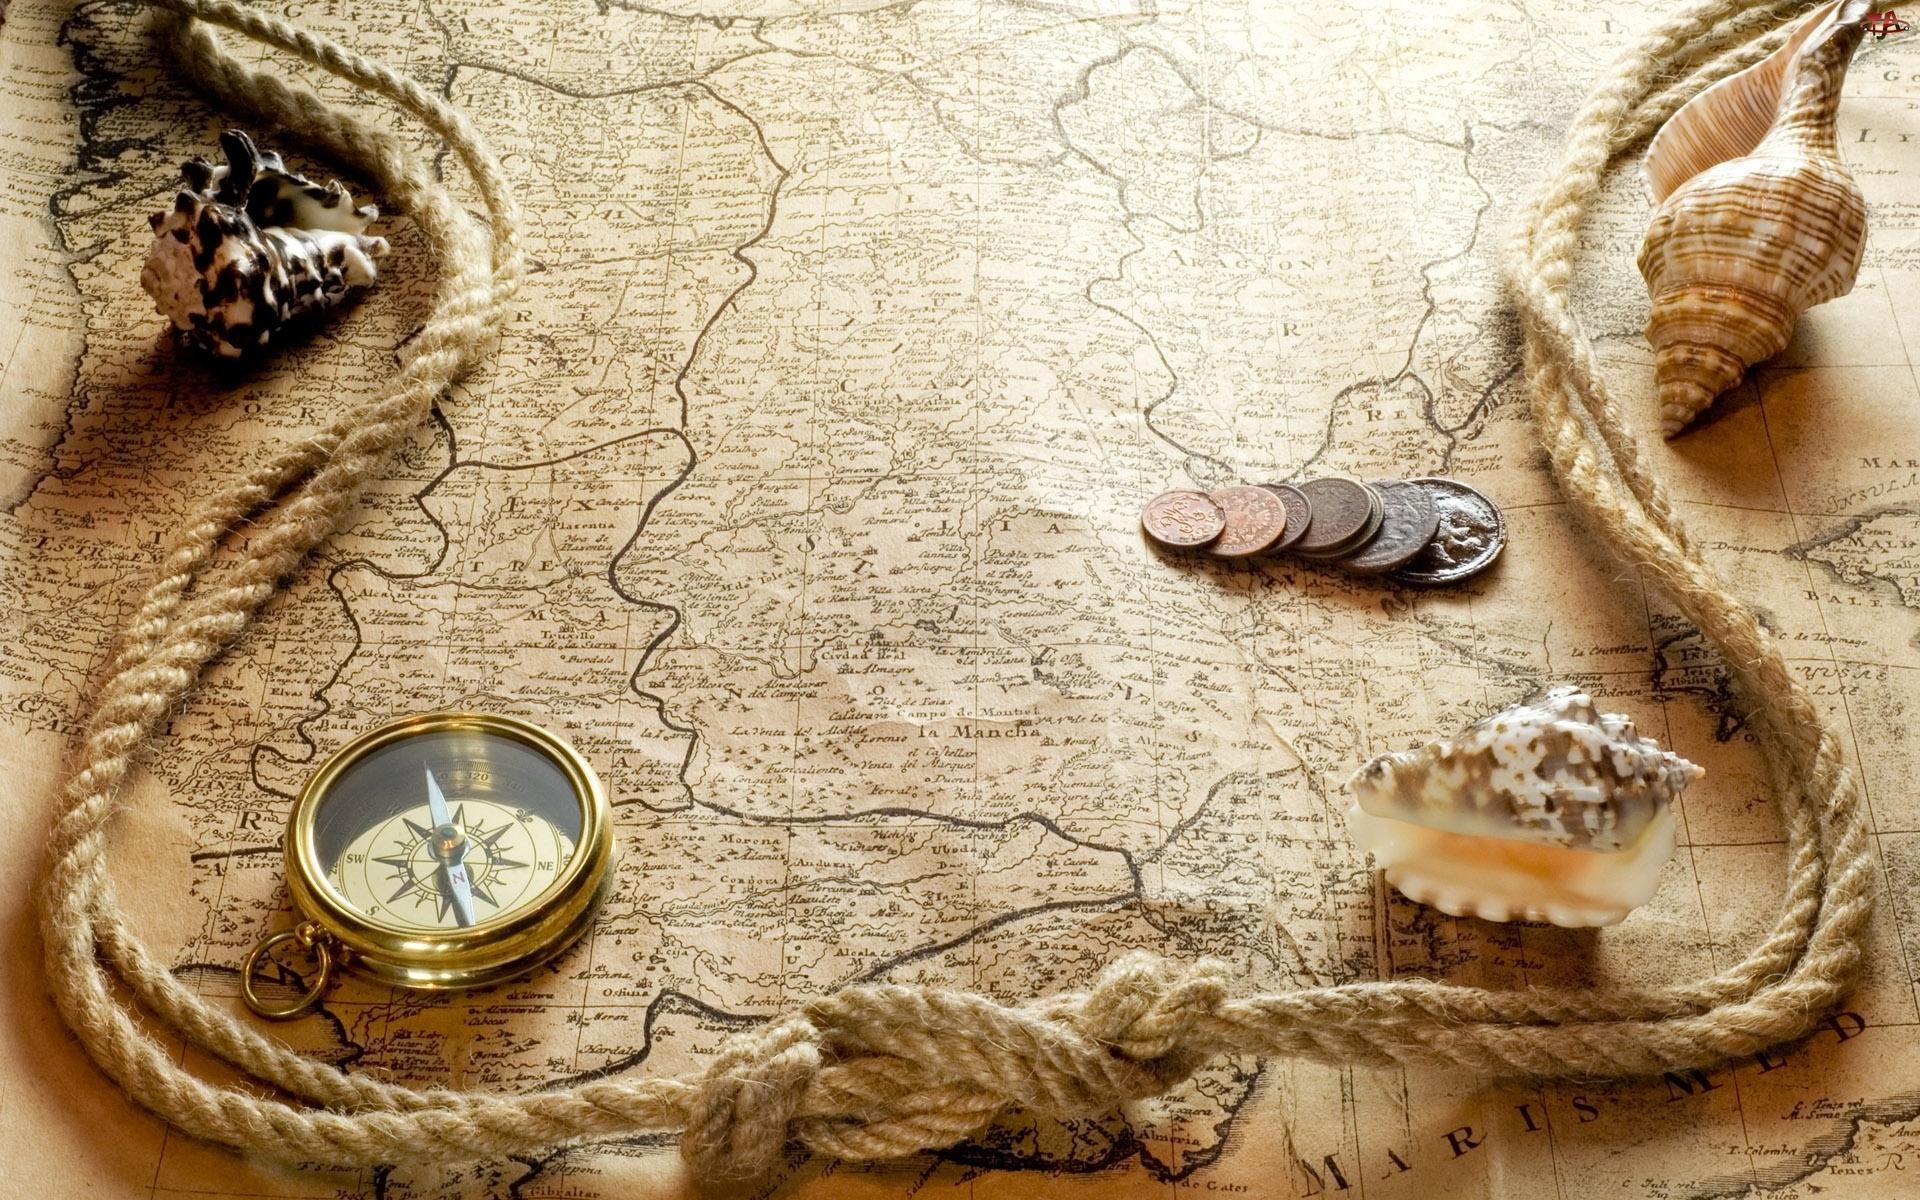 Muszle, Stara, Kompas, Mapa, Sznur